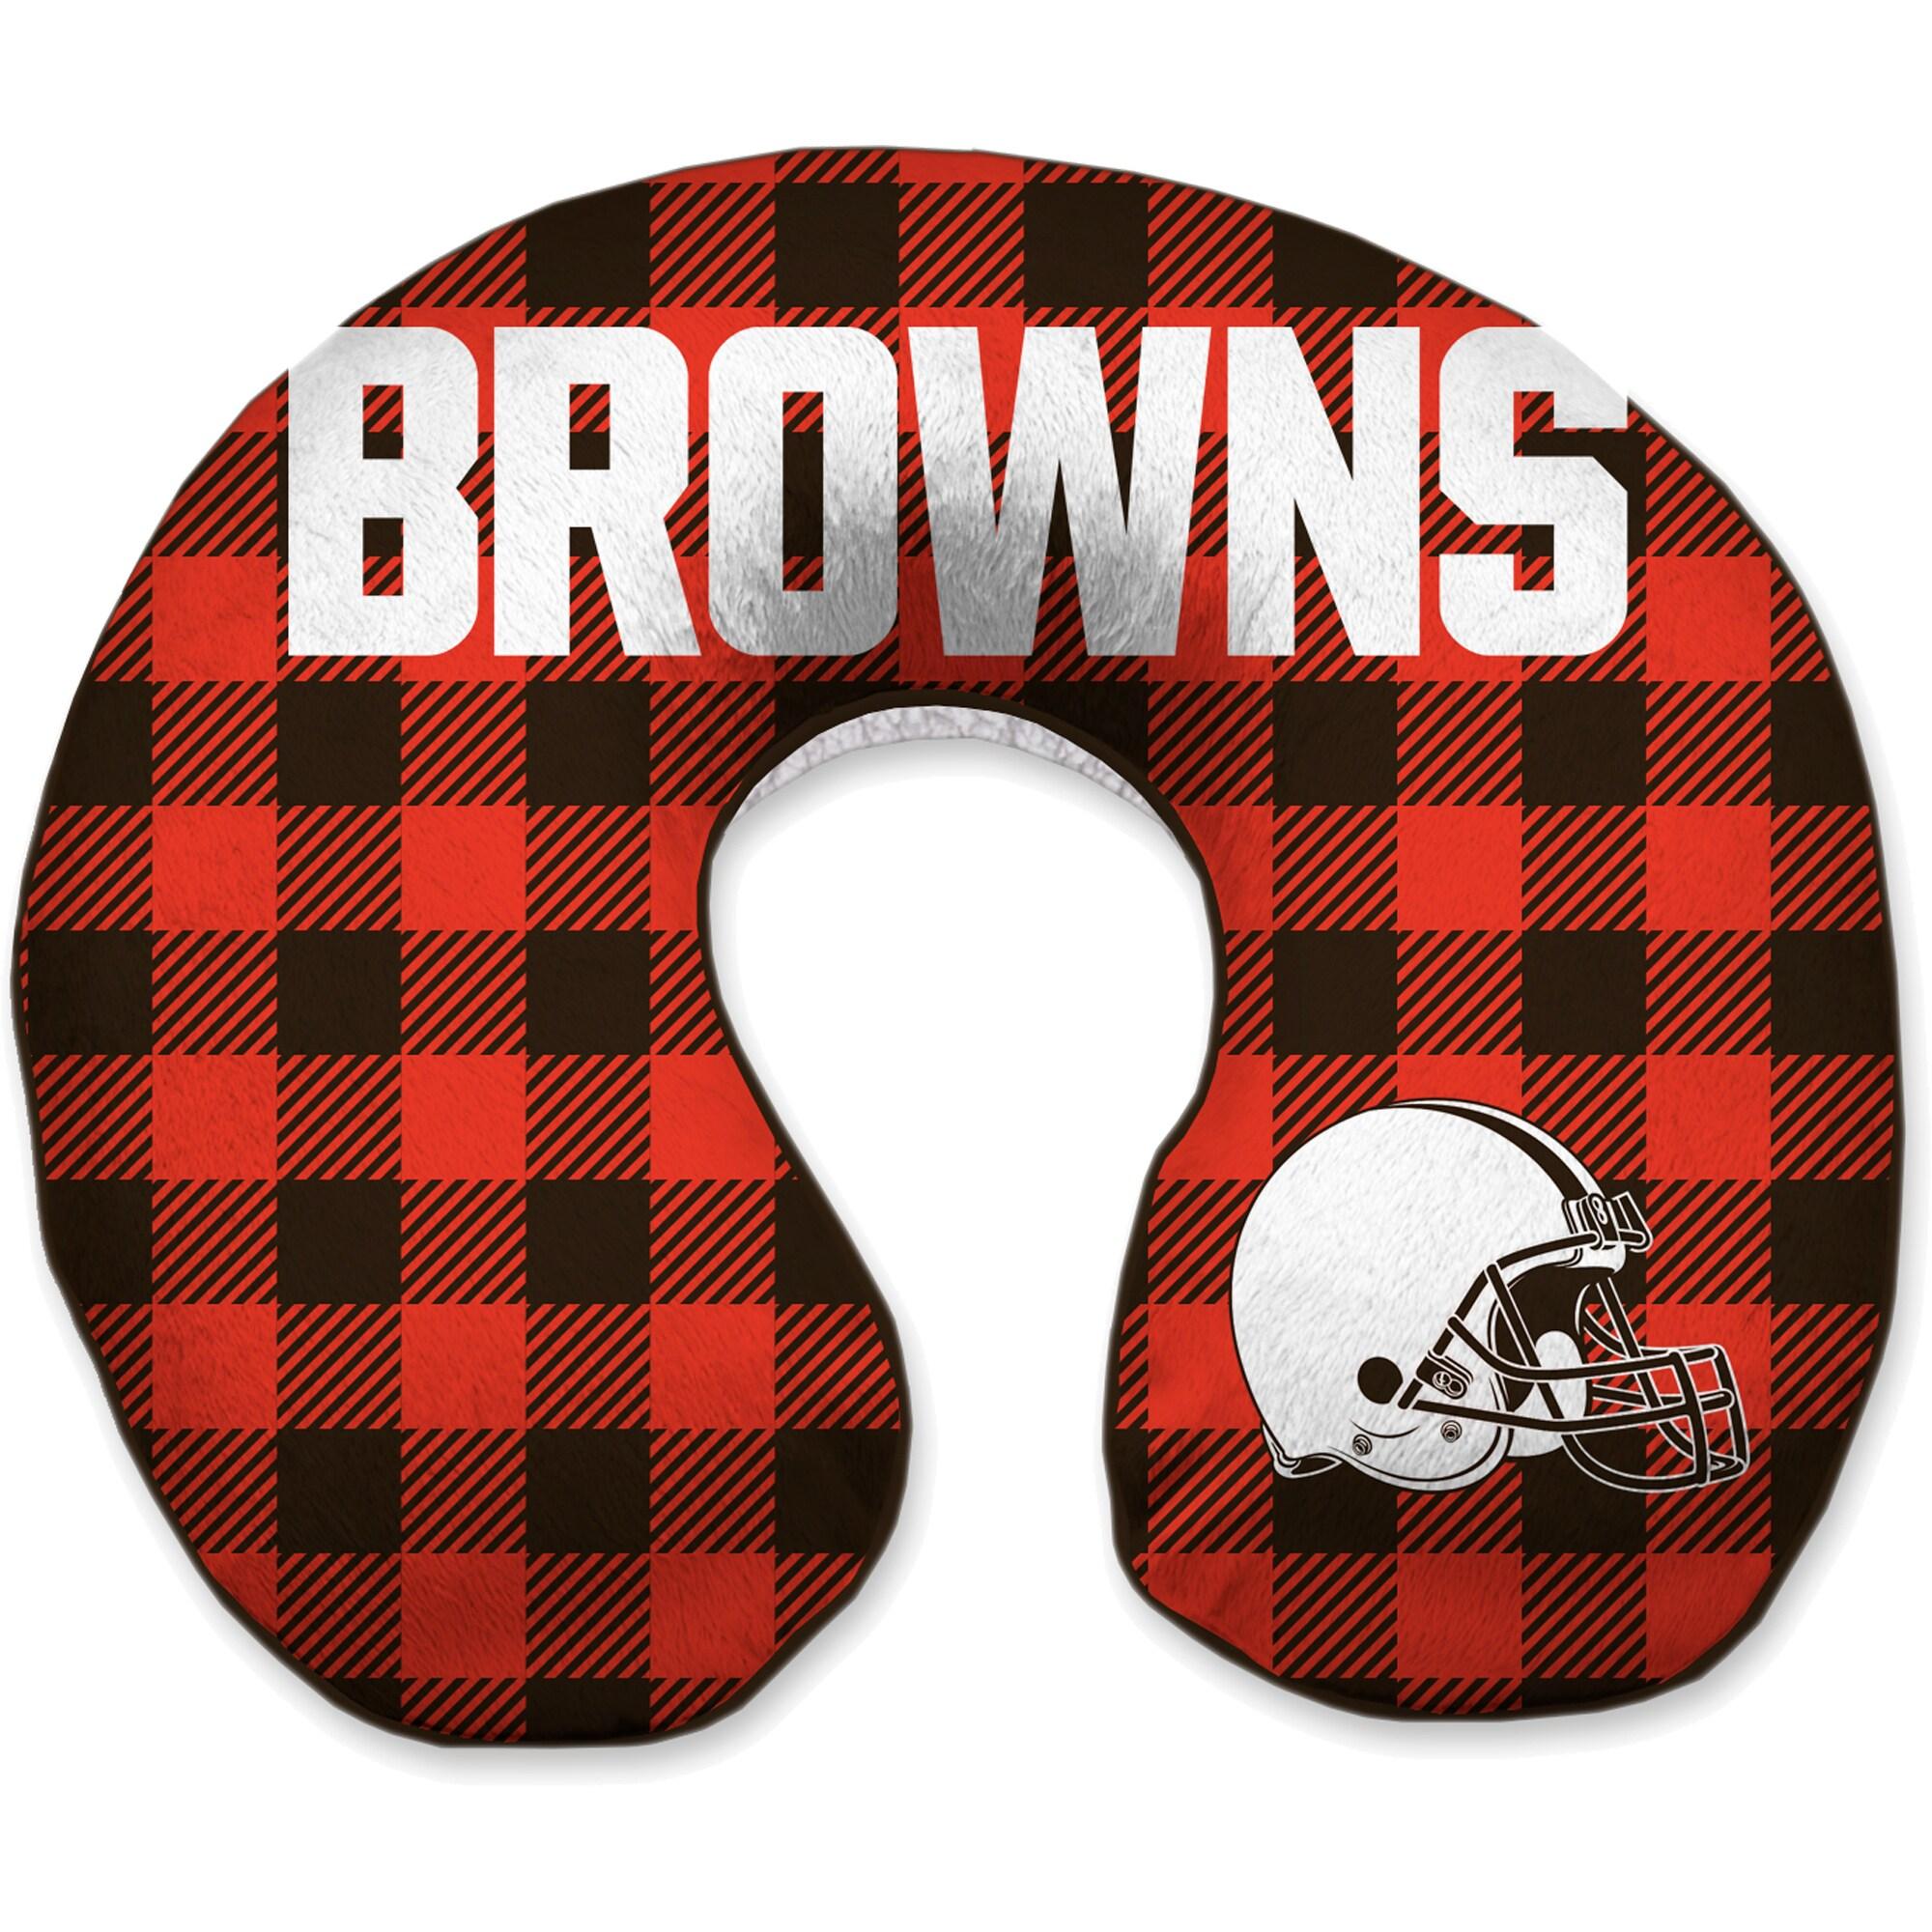 Cleveland Browns Buffalo Check Sherpa Memory Foam Travel Pillow - Brown